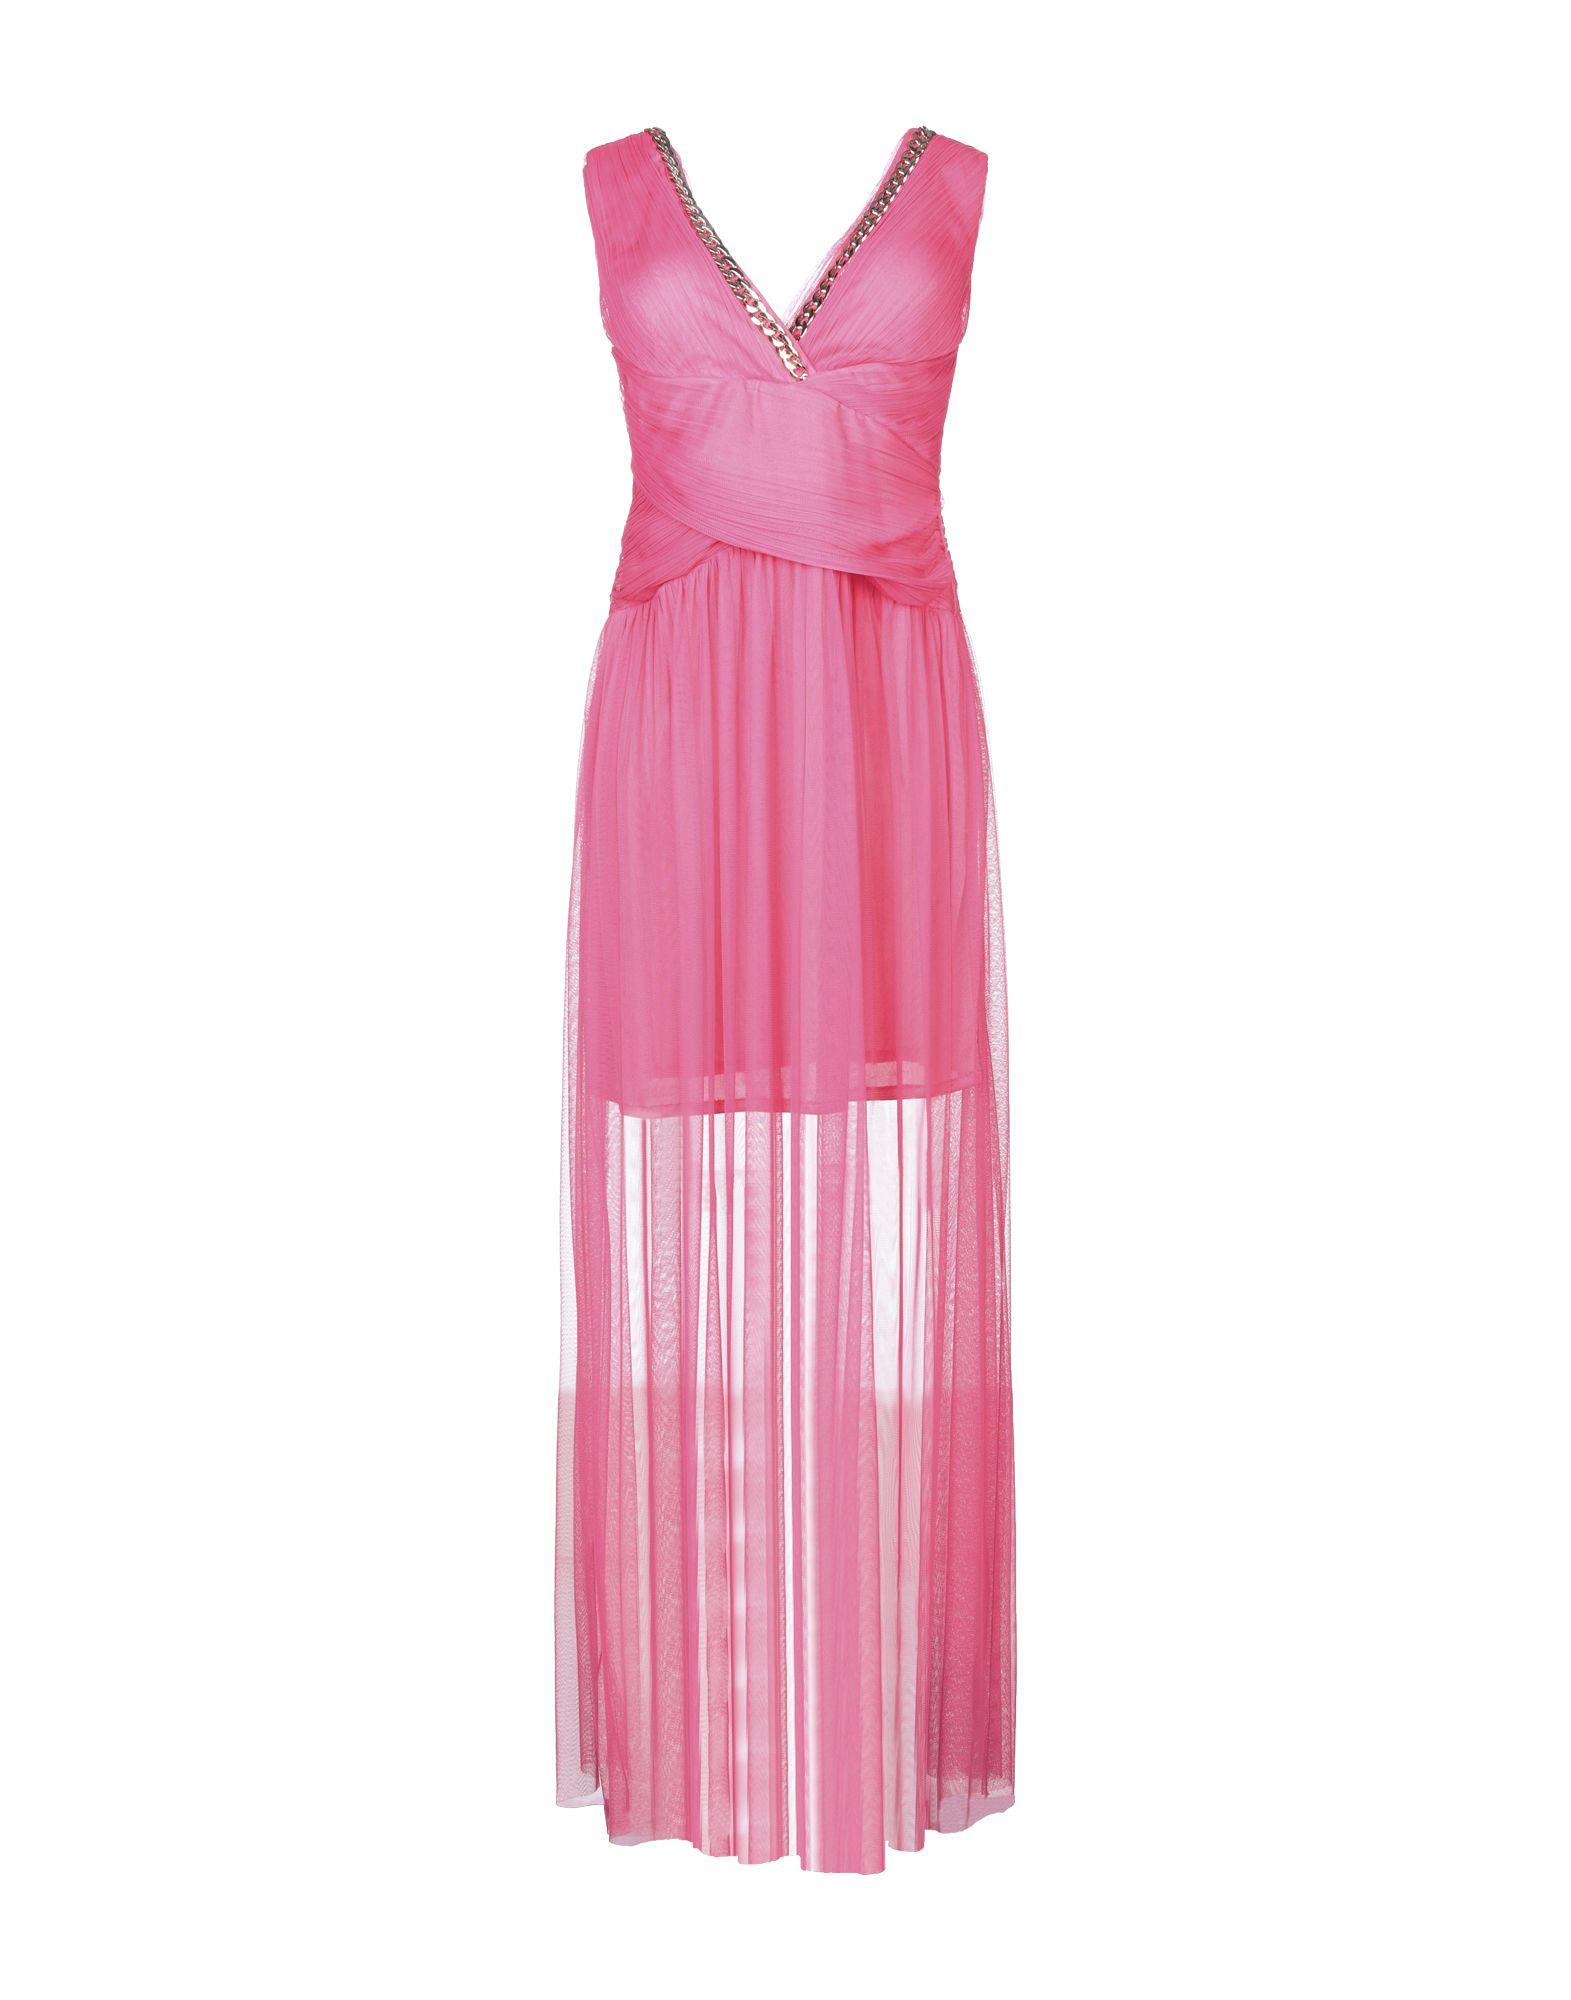 X'S MILANO Длинное платье